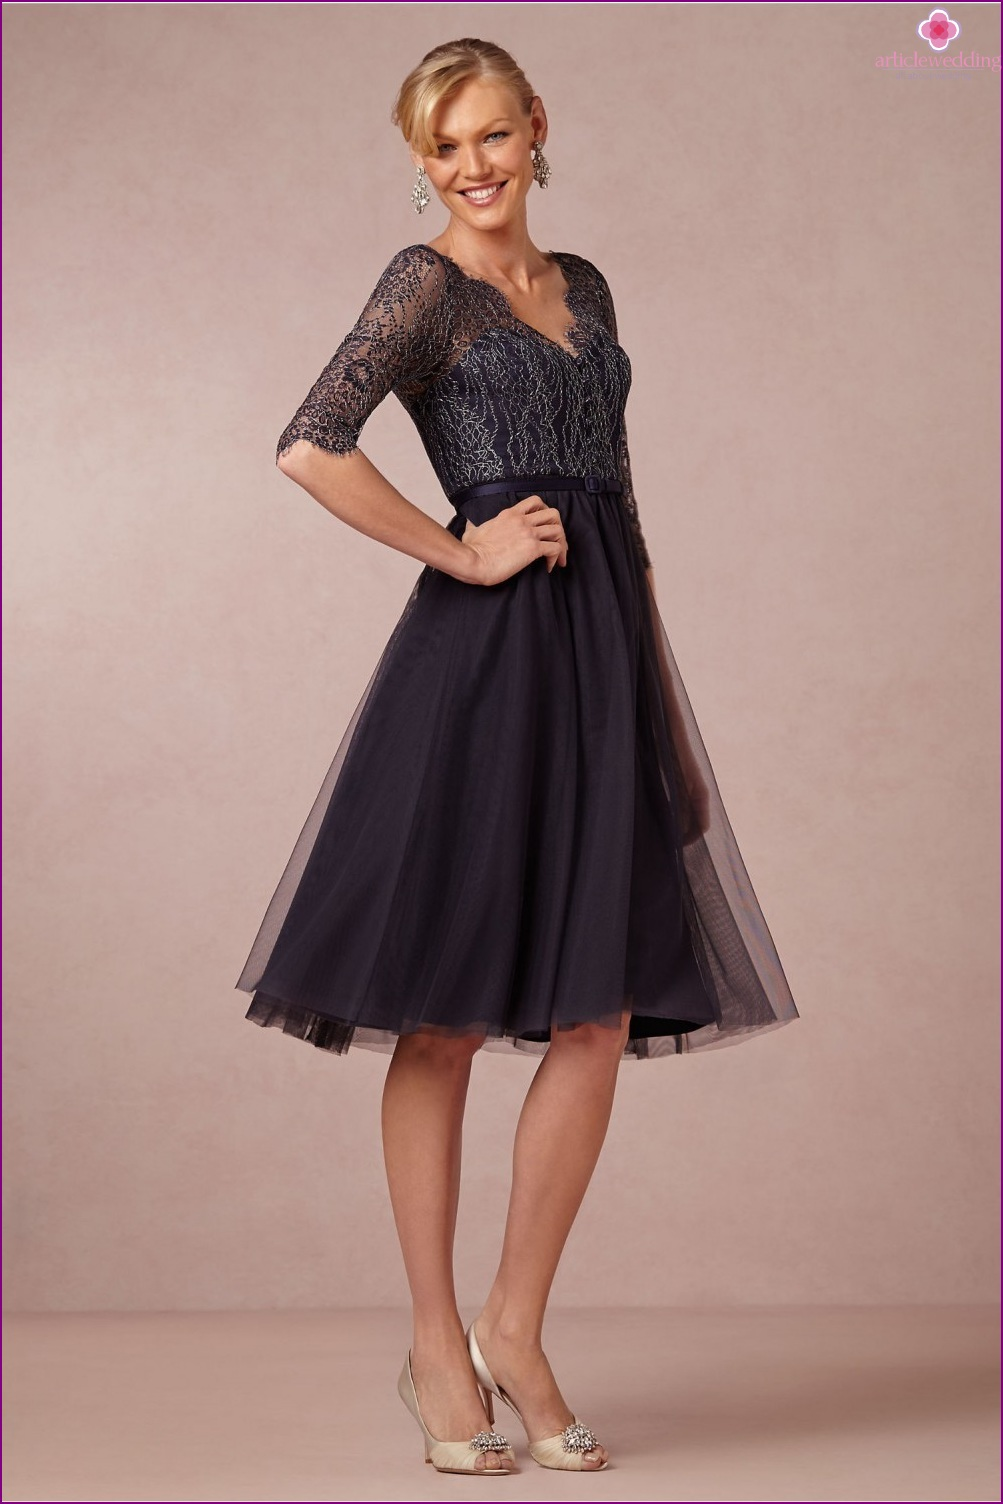 Evening dress of medium length